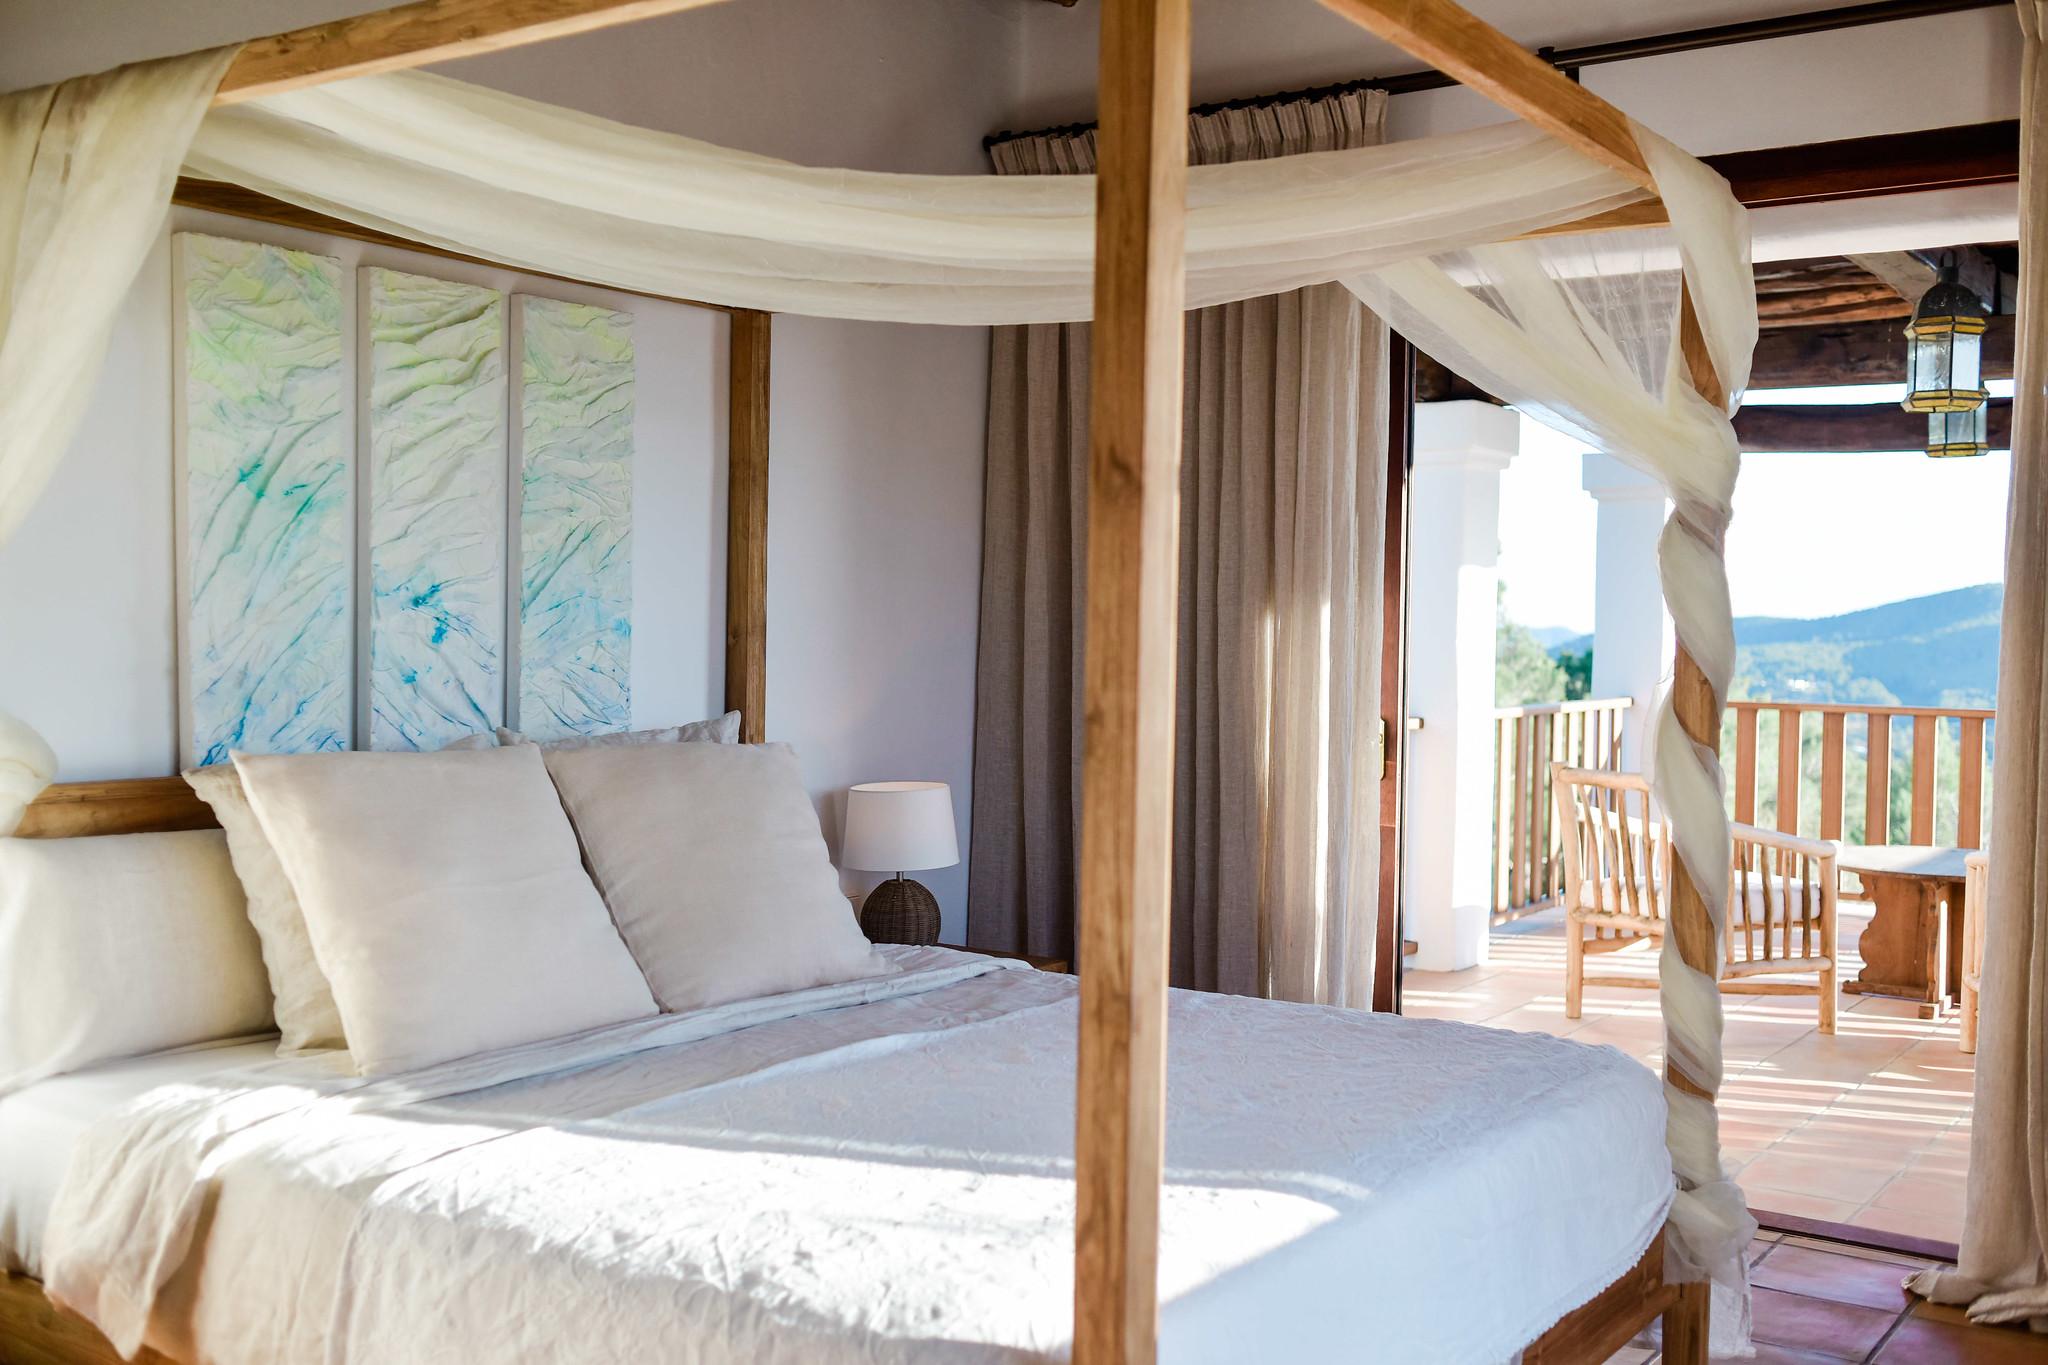 https://www.white-ibiza.com/wp-content/uploads/2020/05/white-ibiza-villas-can-lavanda-bedroom2.jpg